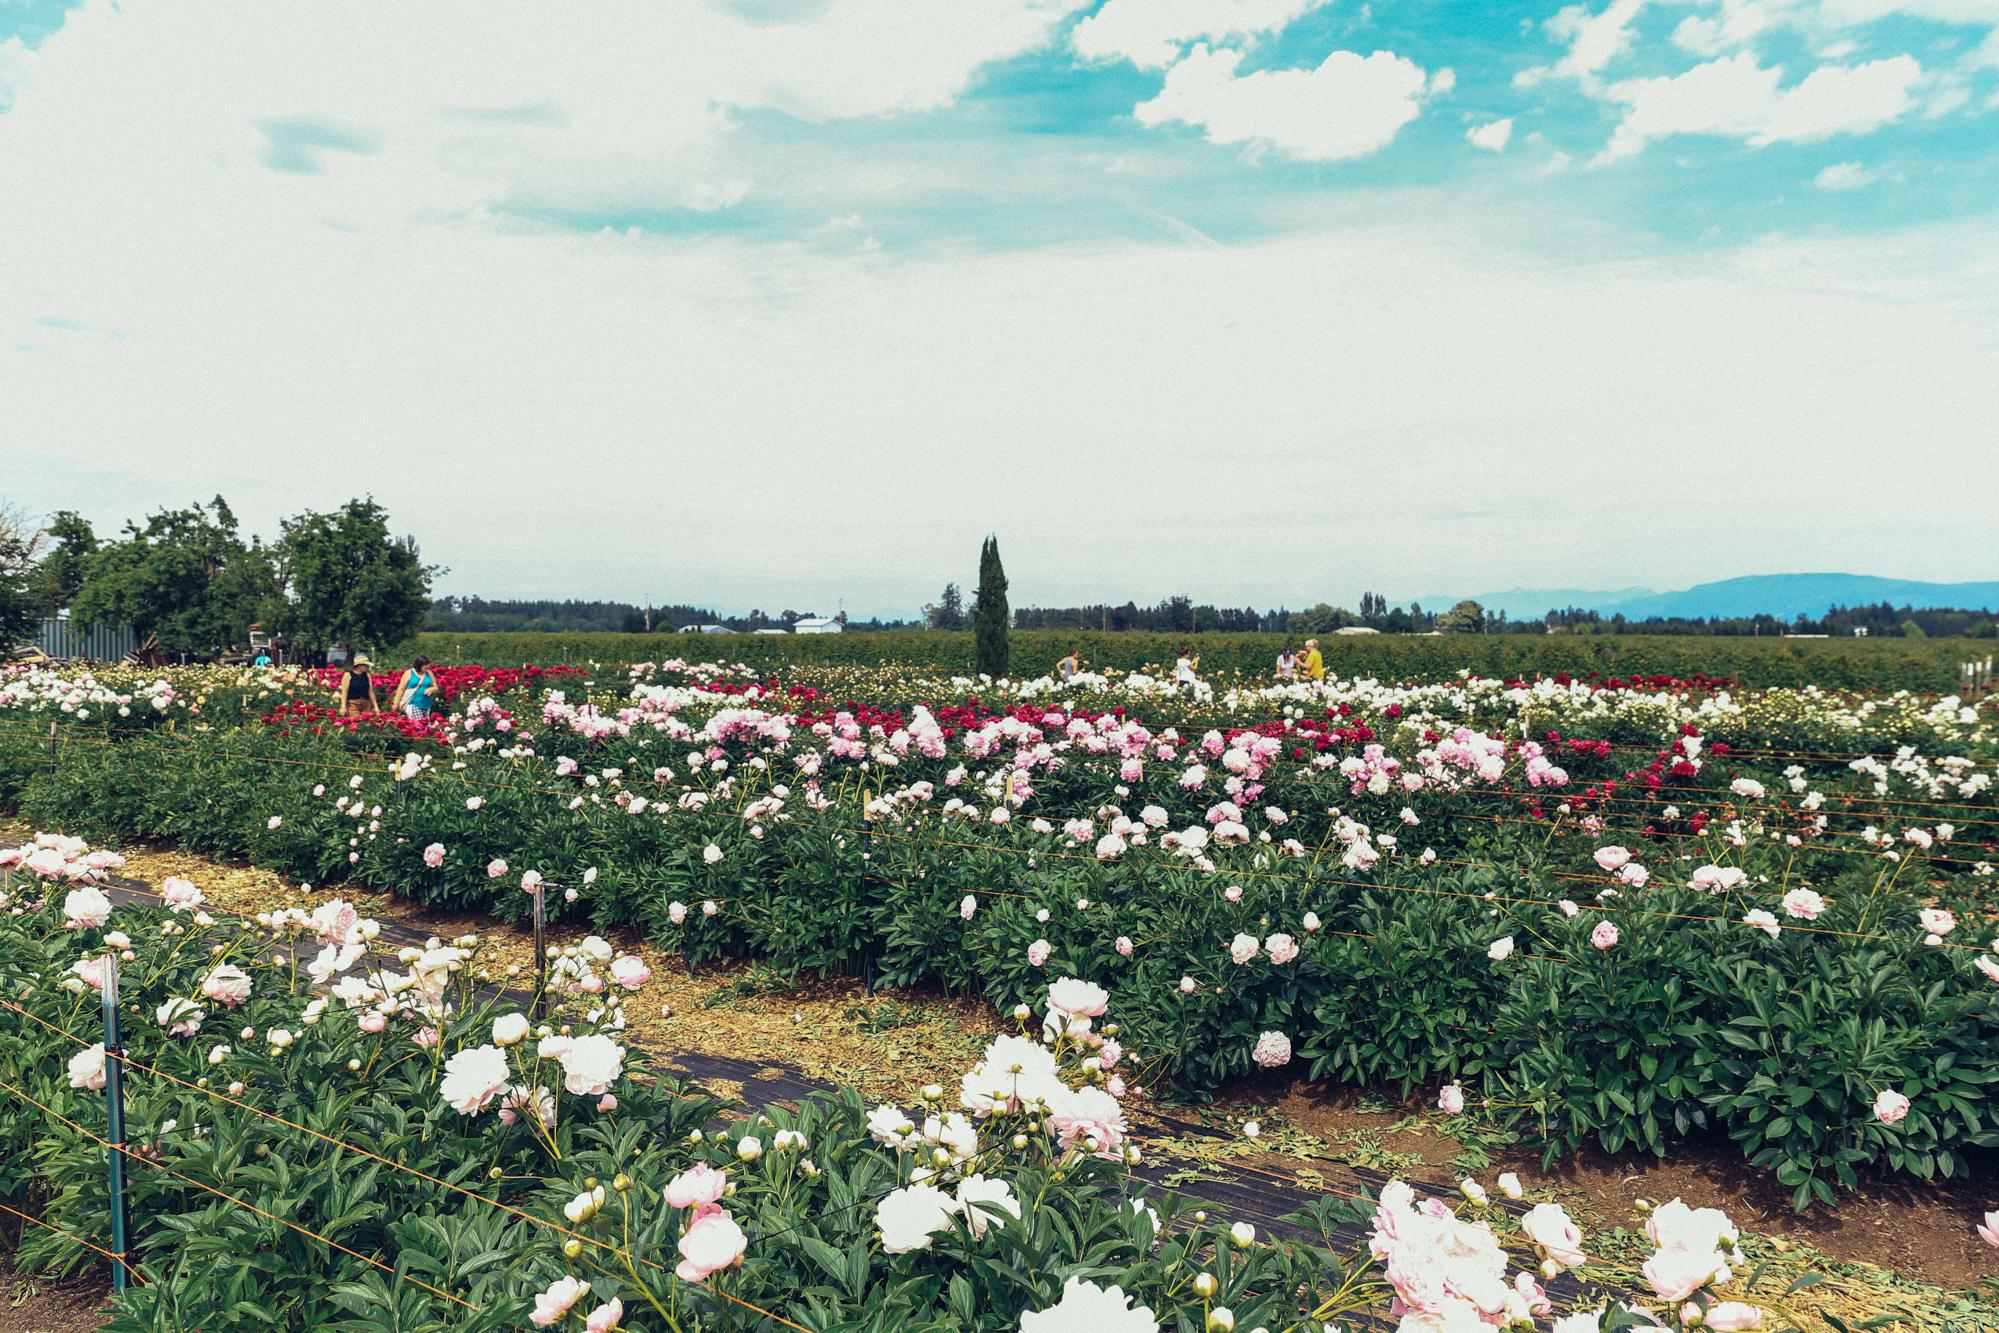 PNW Peony Farm - Oh Flora Travels-2.jpg